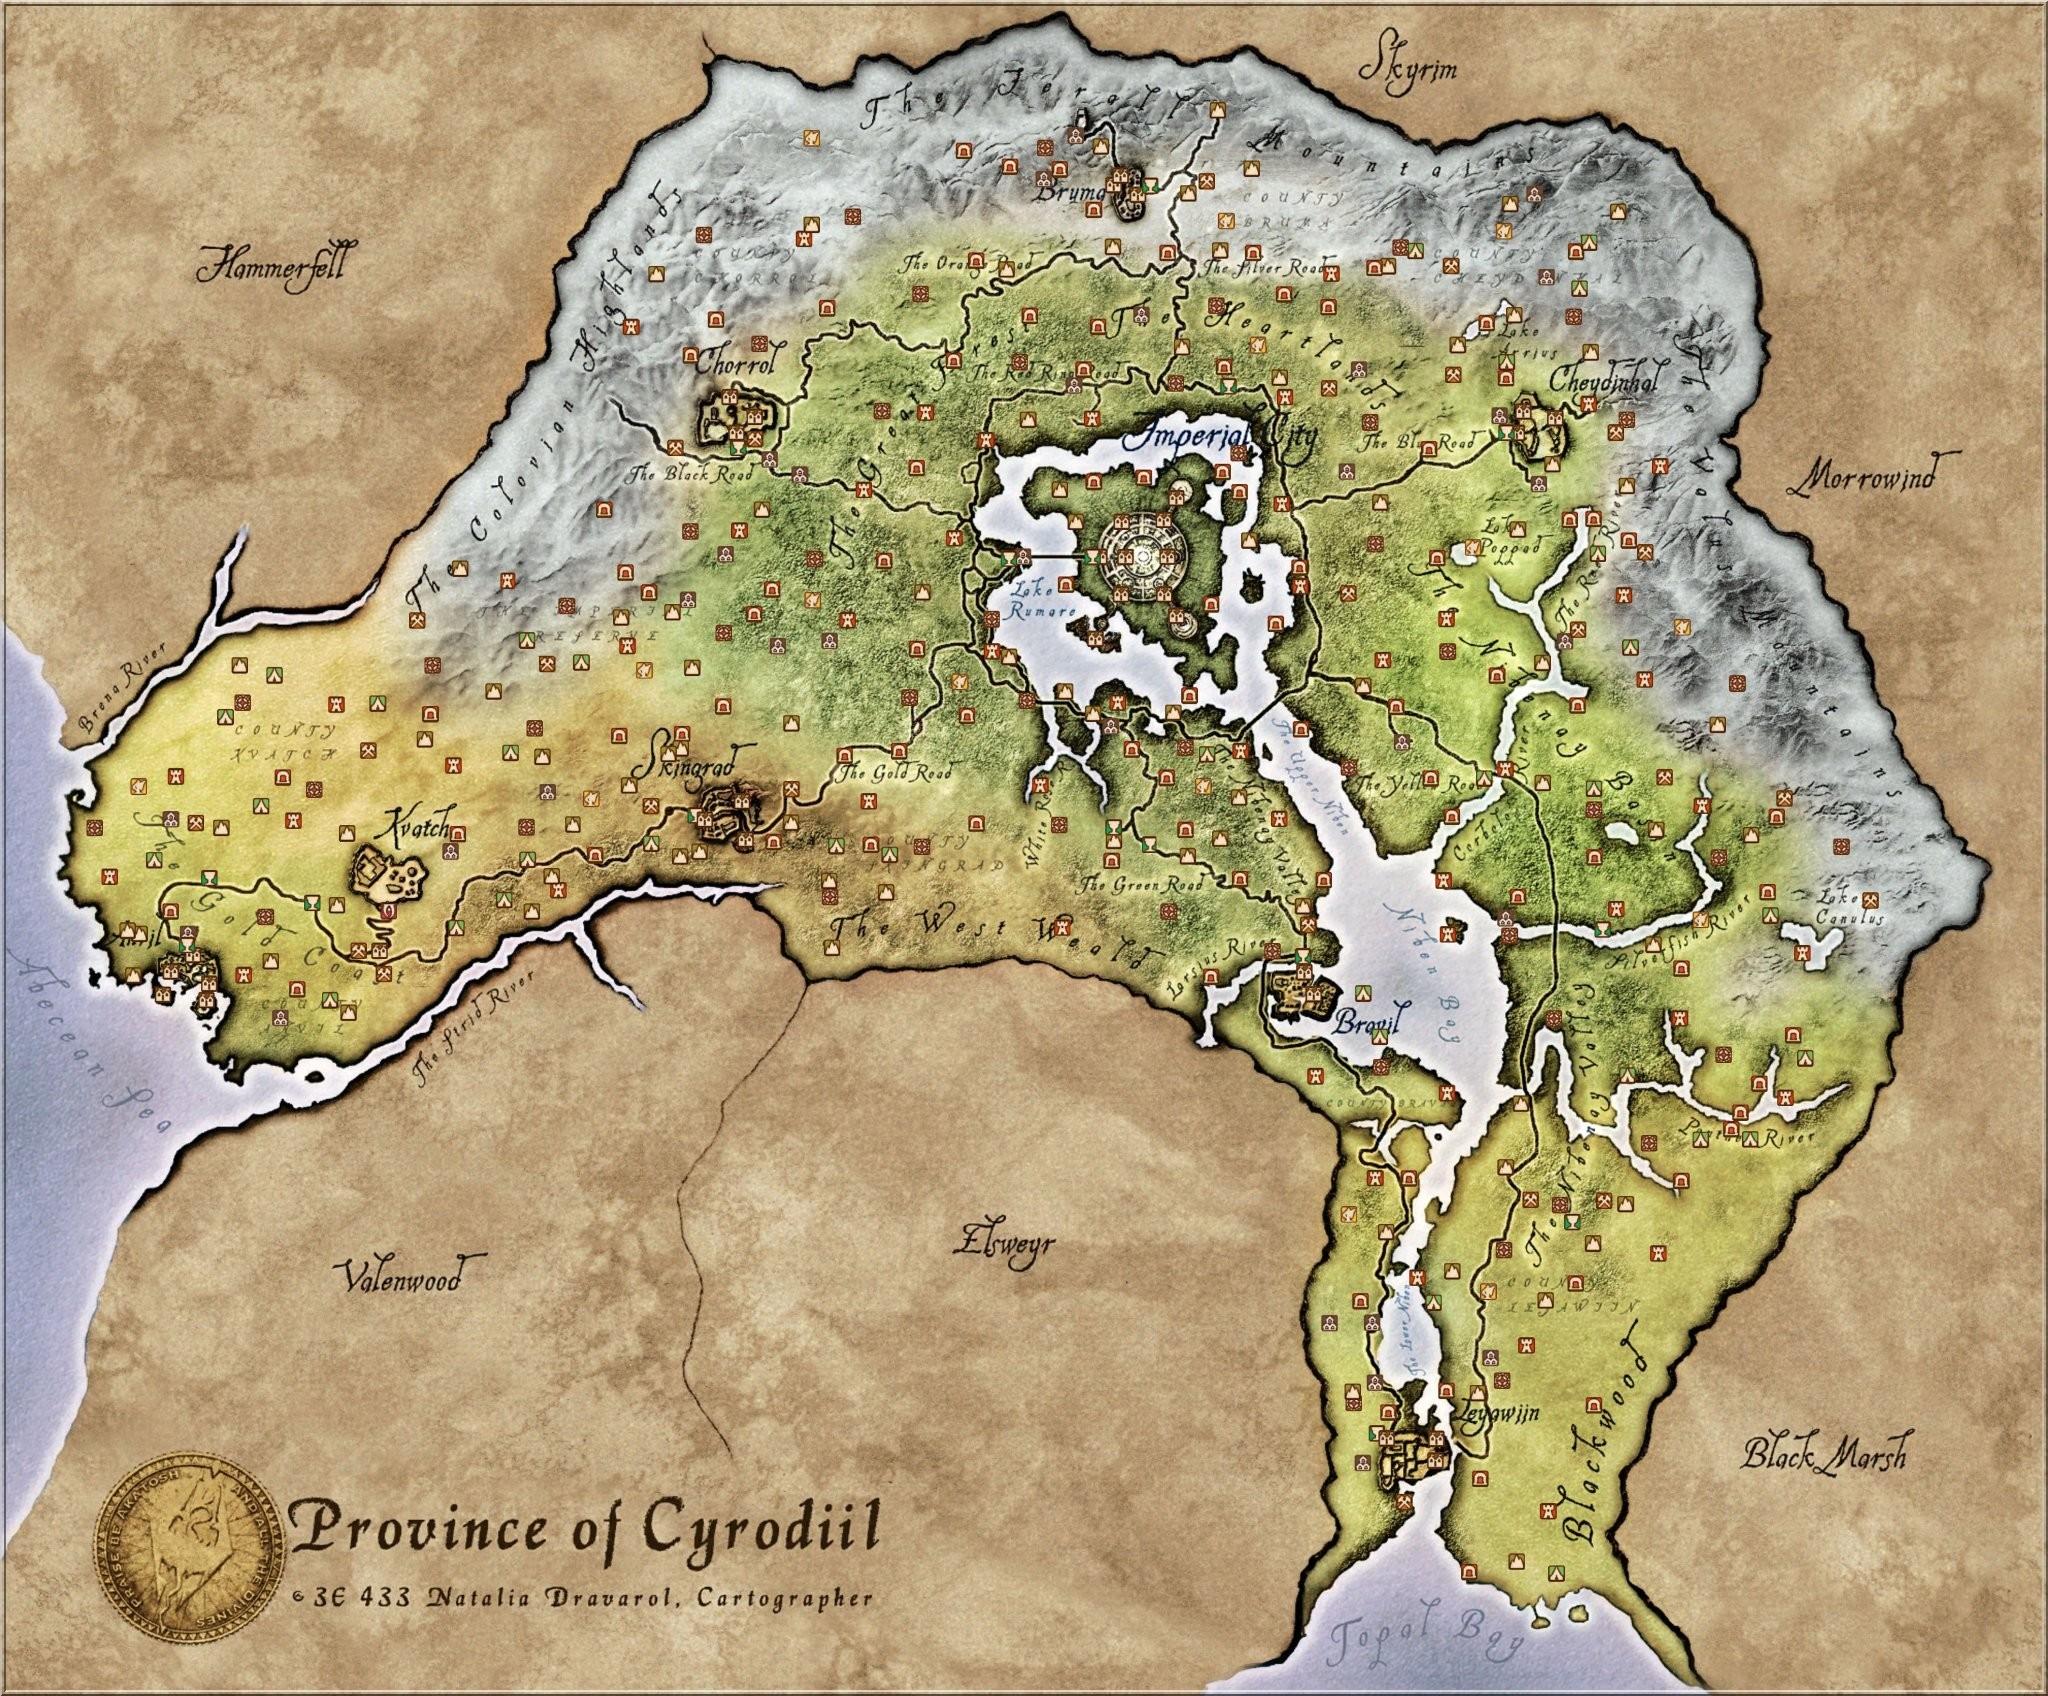 http://img3.wikia.nocookie.net/__cb20140405205727/elderscrolls2/de/images/1/1f/Karte_von_cyrodiil_1.jpg